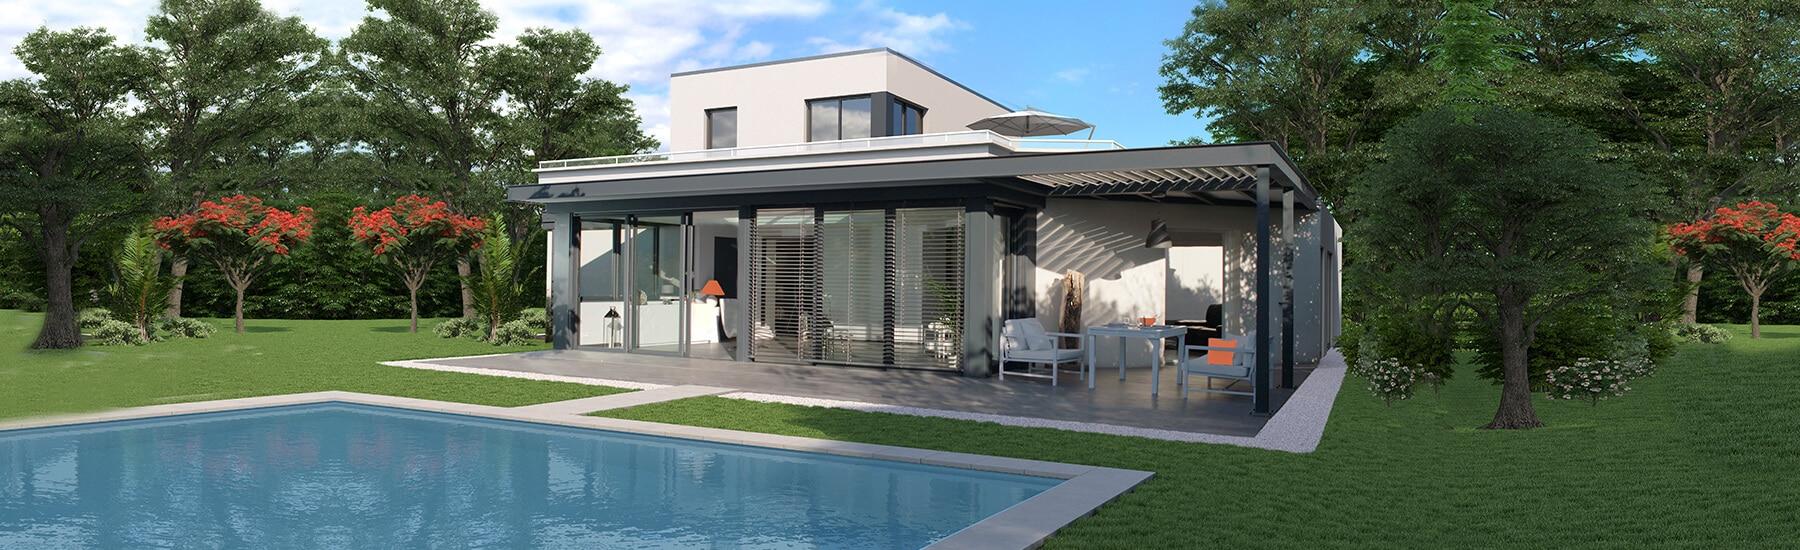 Couvrir Une Terrasse Permis De Construire avec quoi couvrir une pergola ? | concept alu